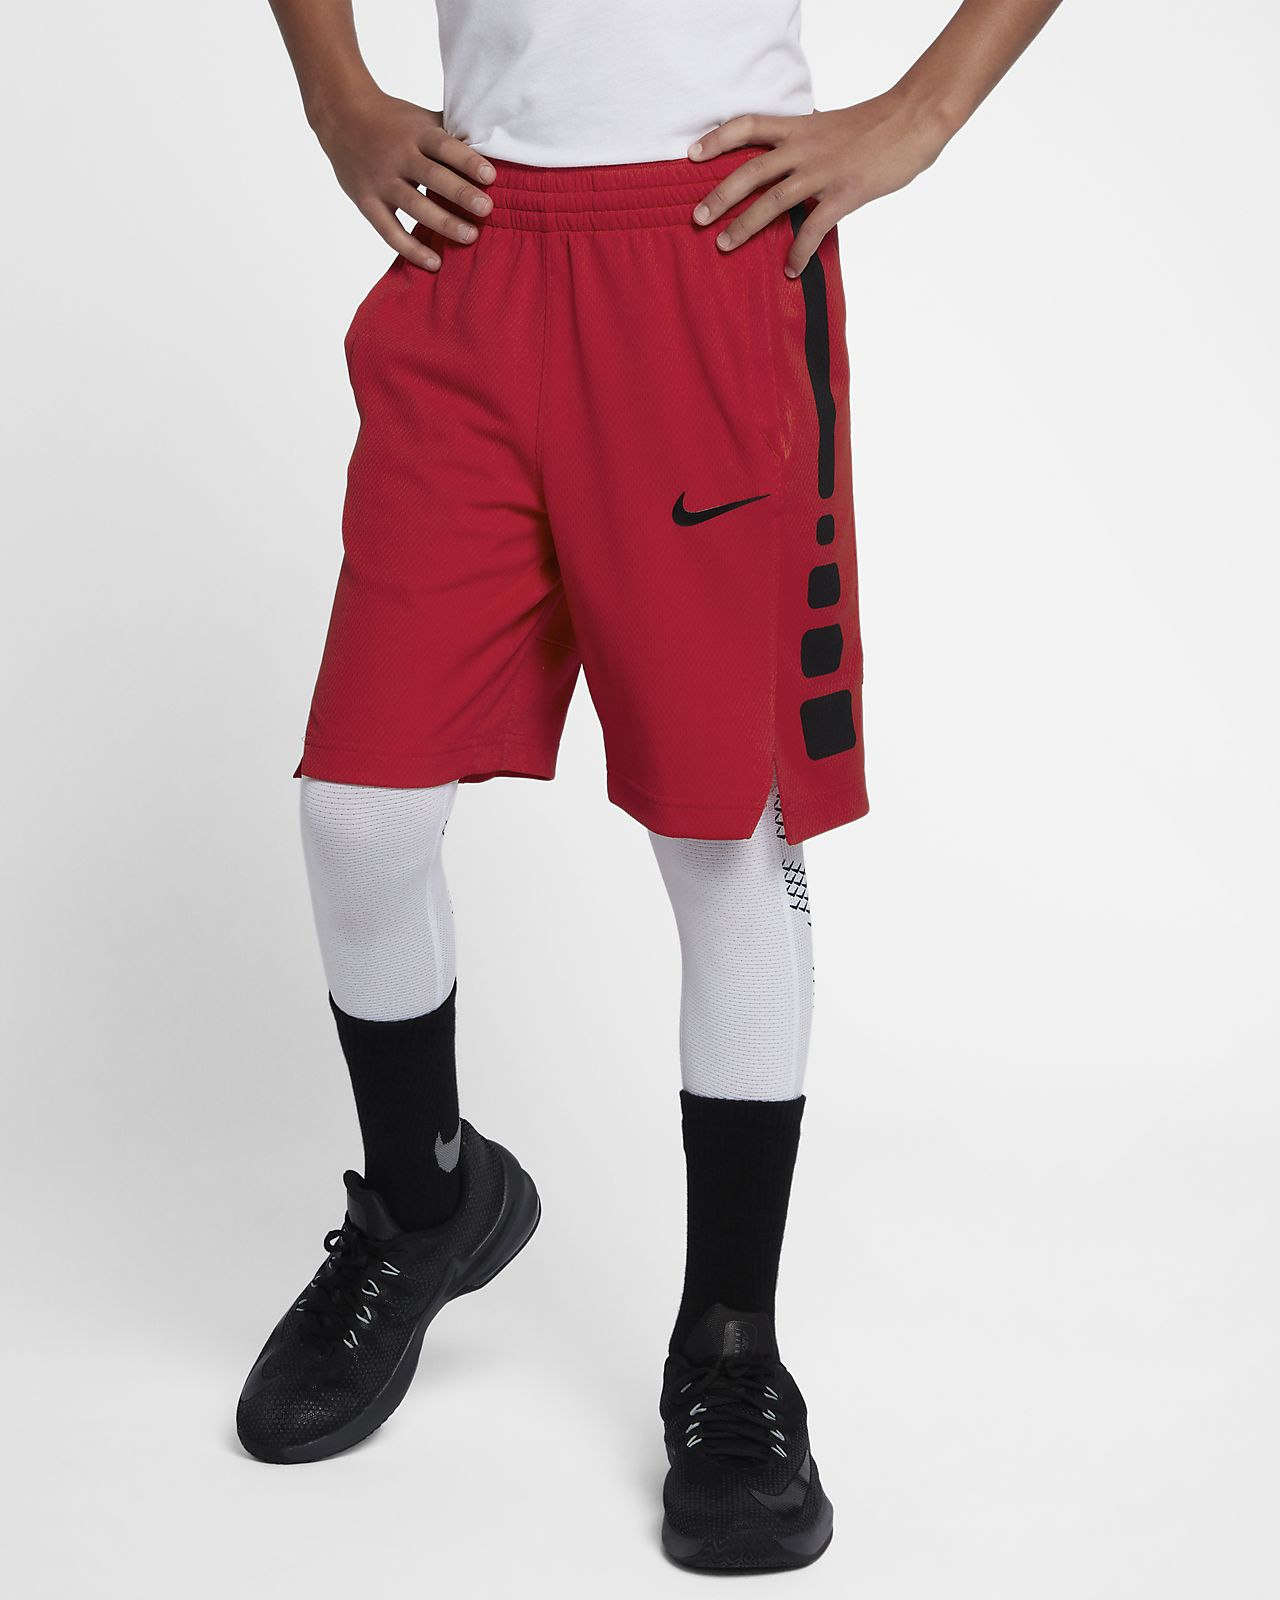 a4da3d23c008 Nike Dri-FIT Elite Big Kids  (Boys ) Basketball Shorts. Nike.com